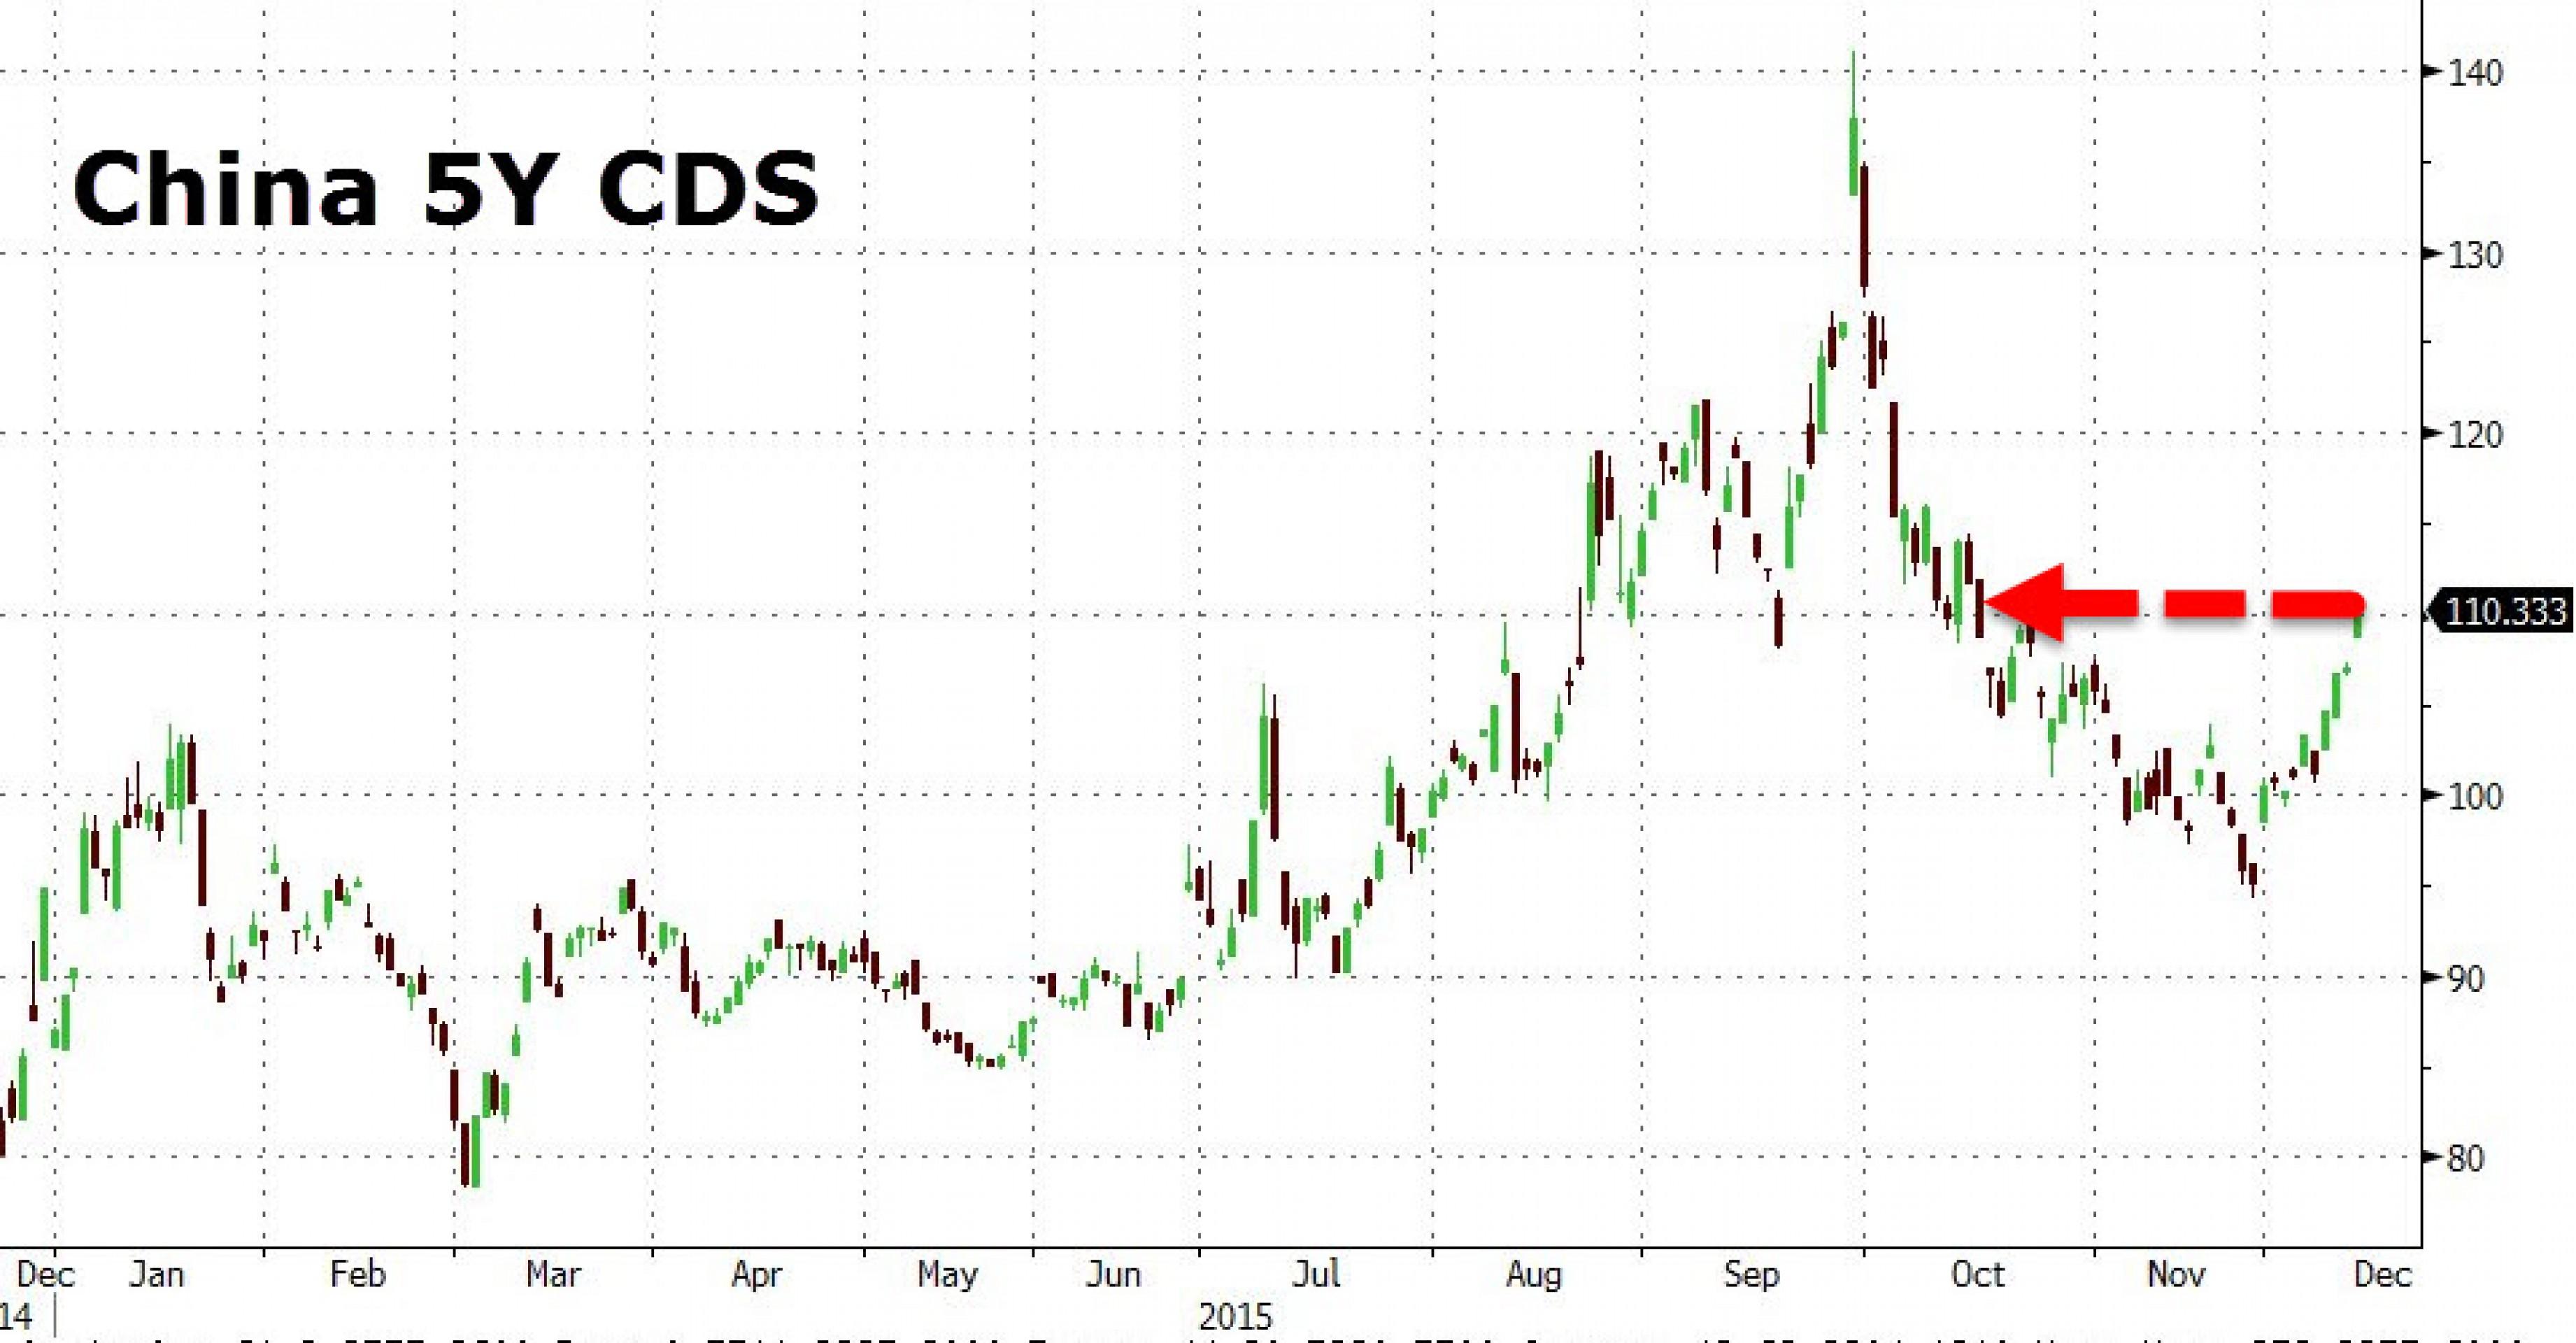 Девальвация юаня начнет новую валютную войну